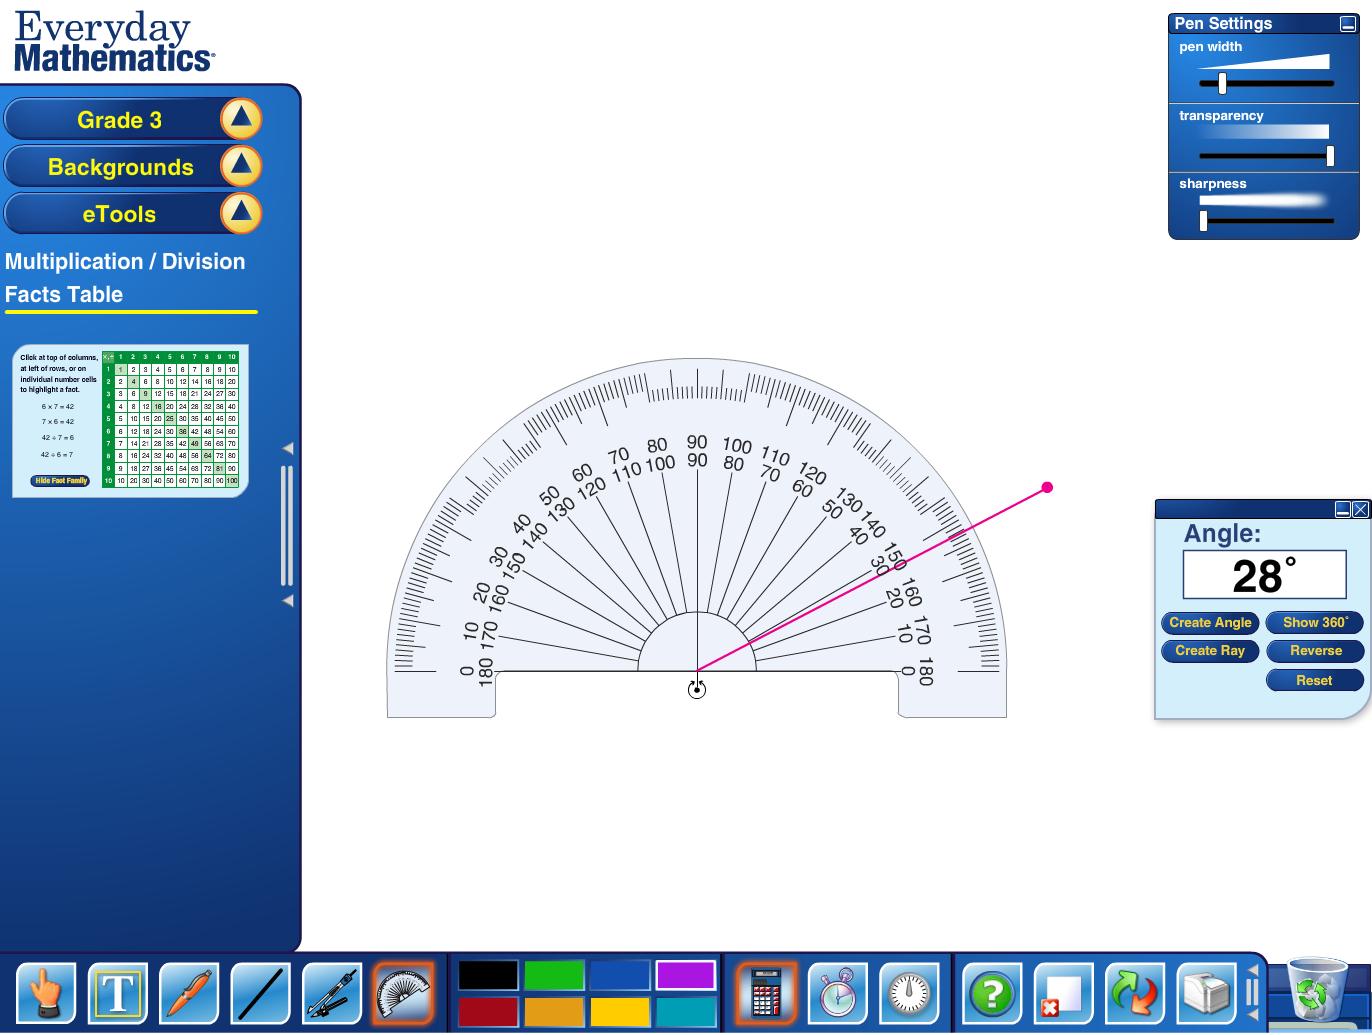 Everyday Mathematics A Good Set Of Virtual Tools A